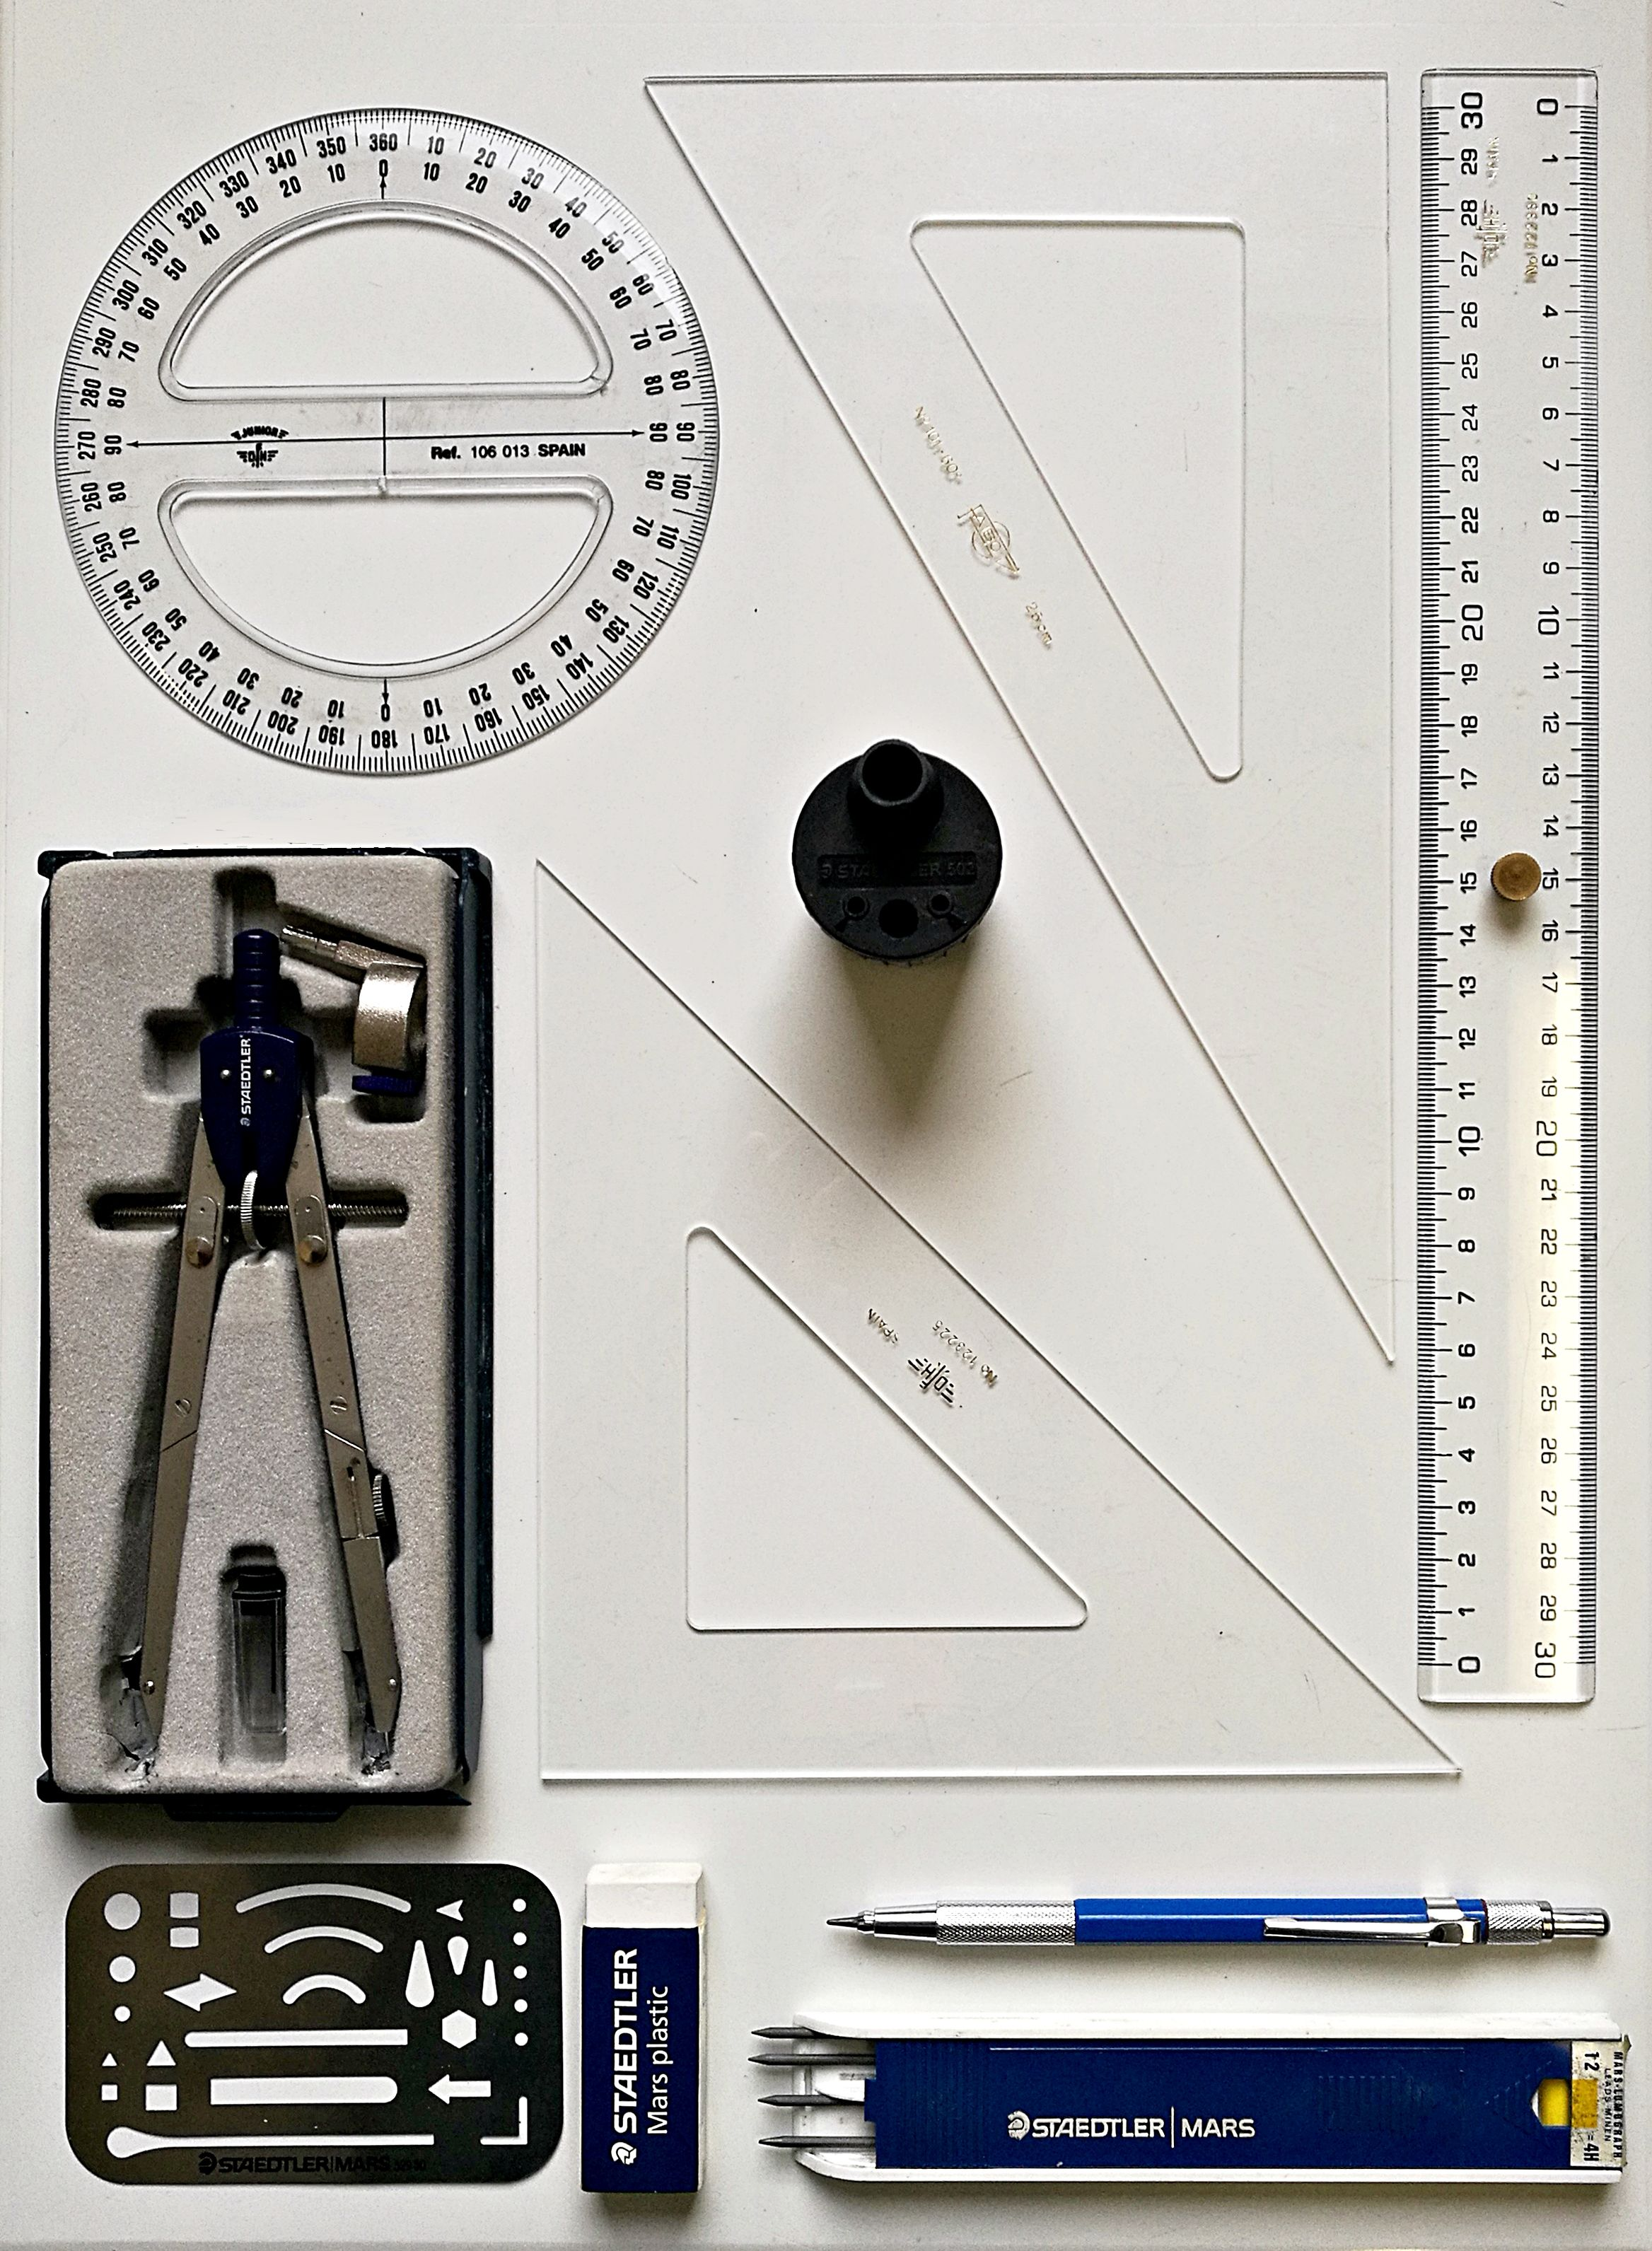 Material Basico Para Dibujo Tecnico A Lapiz En Bachillerato Materiales De Dibujo Tecnico Instrumentos De Dibujo Tecnicas De Dibujo